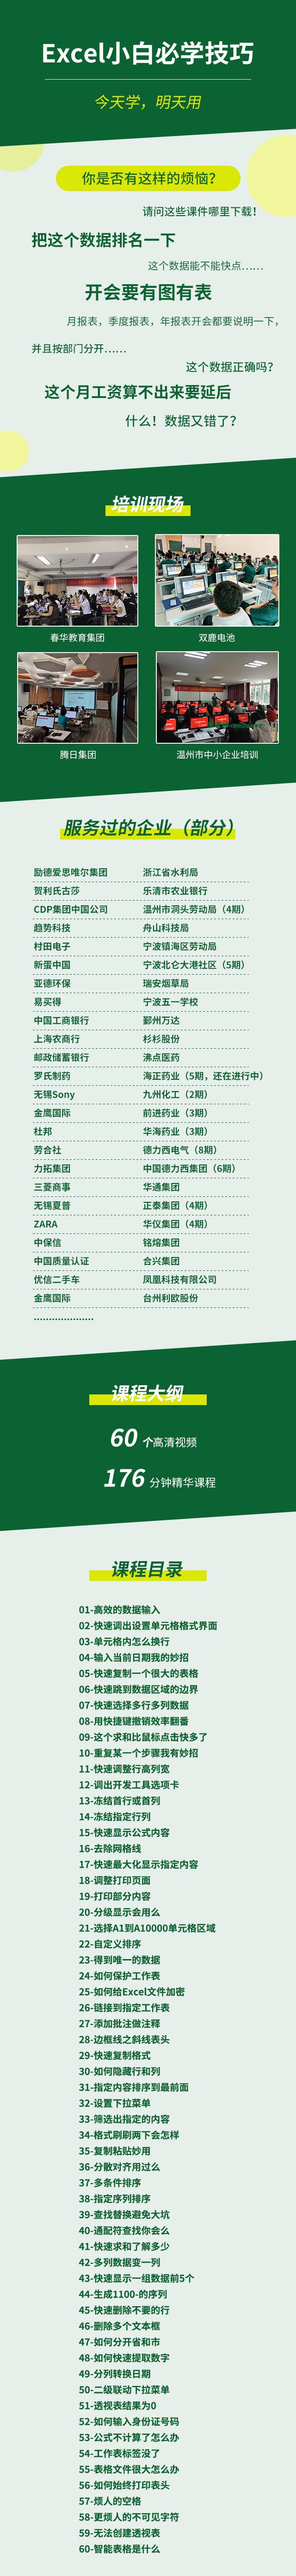 312-Excel小白必学技巧.jpg